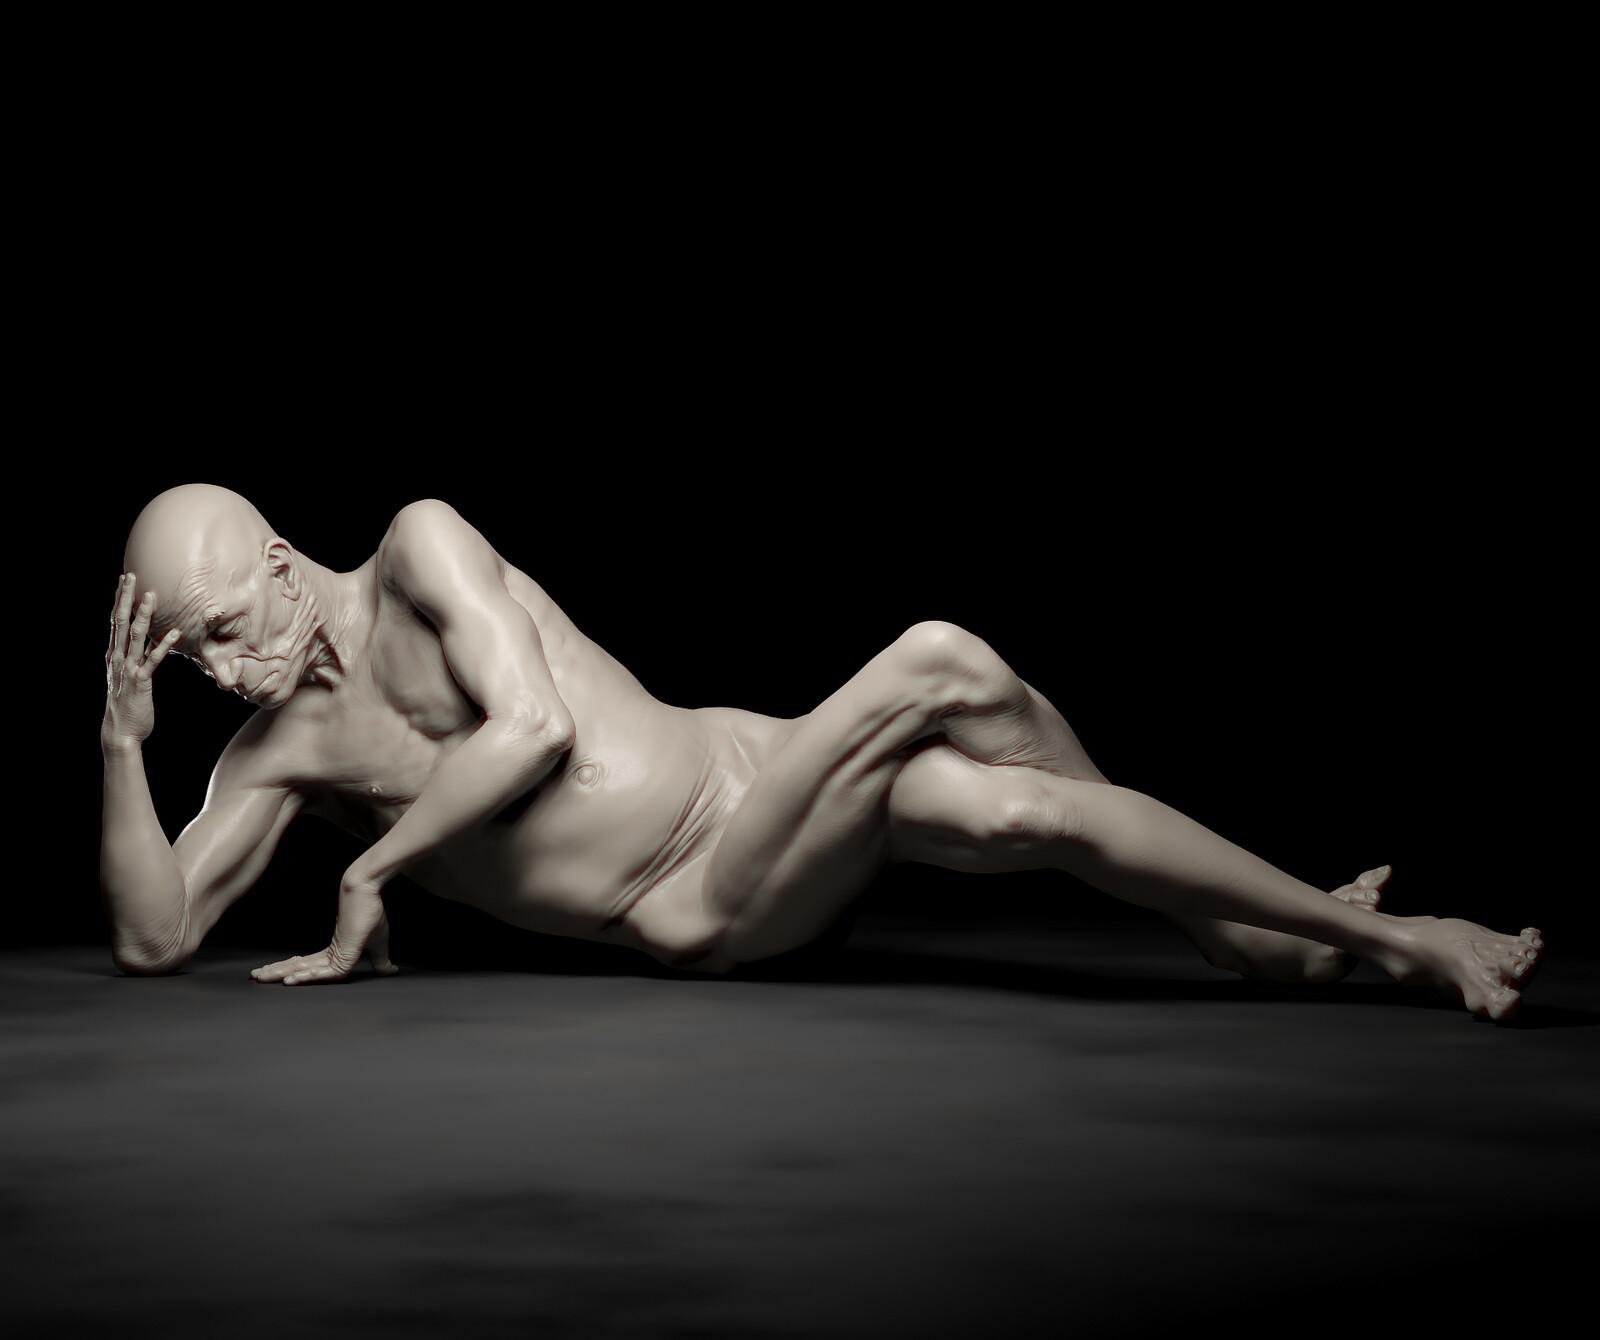 Anatomy and Pose Study